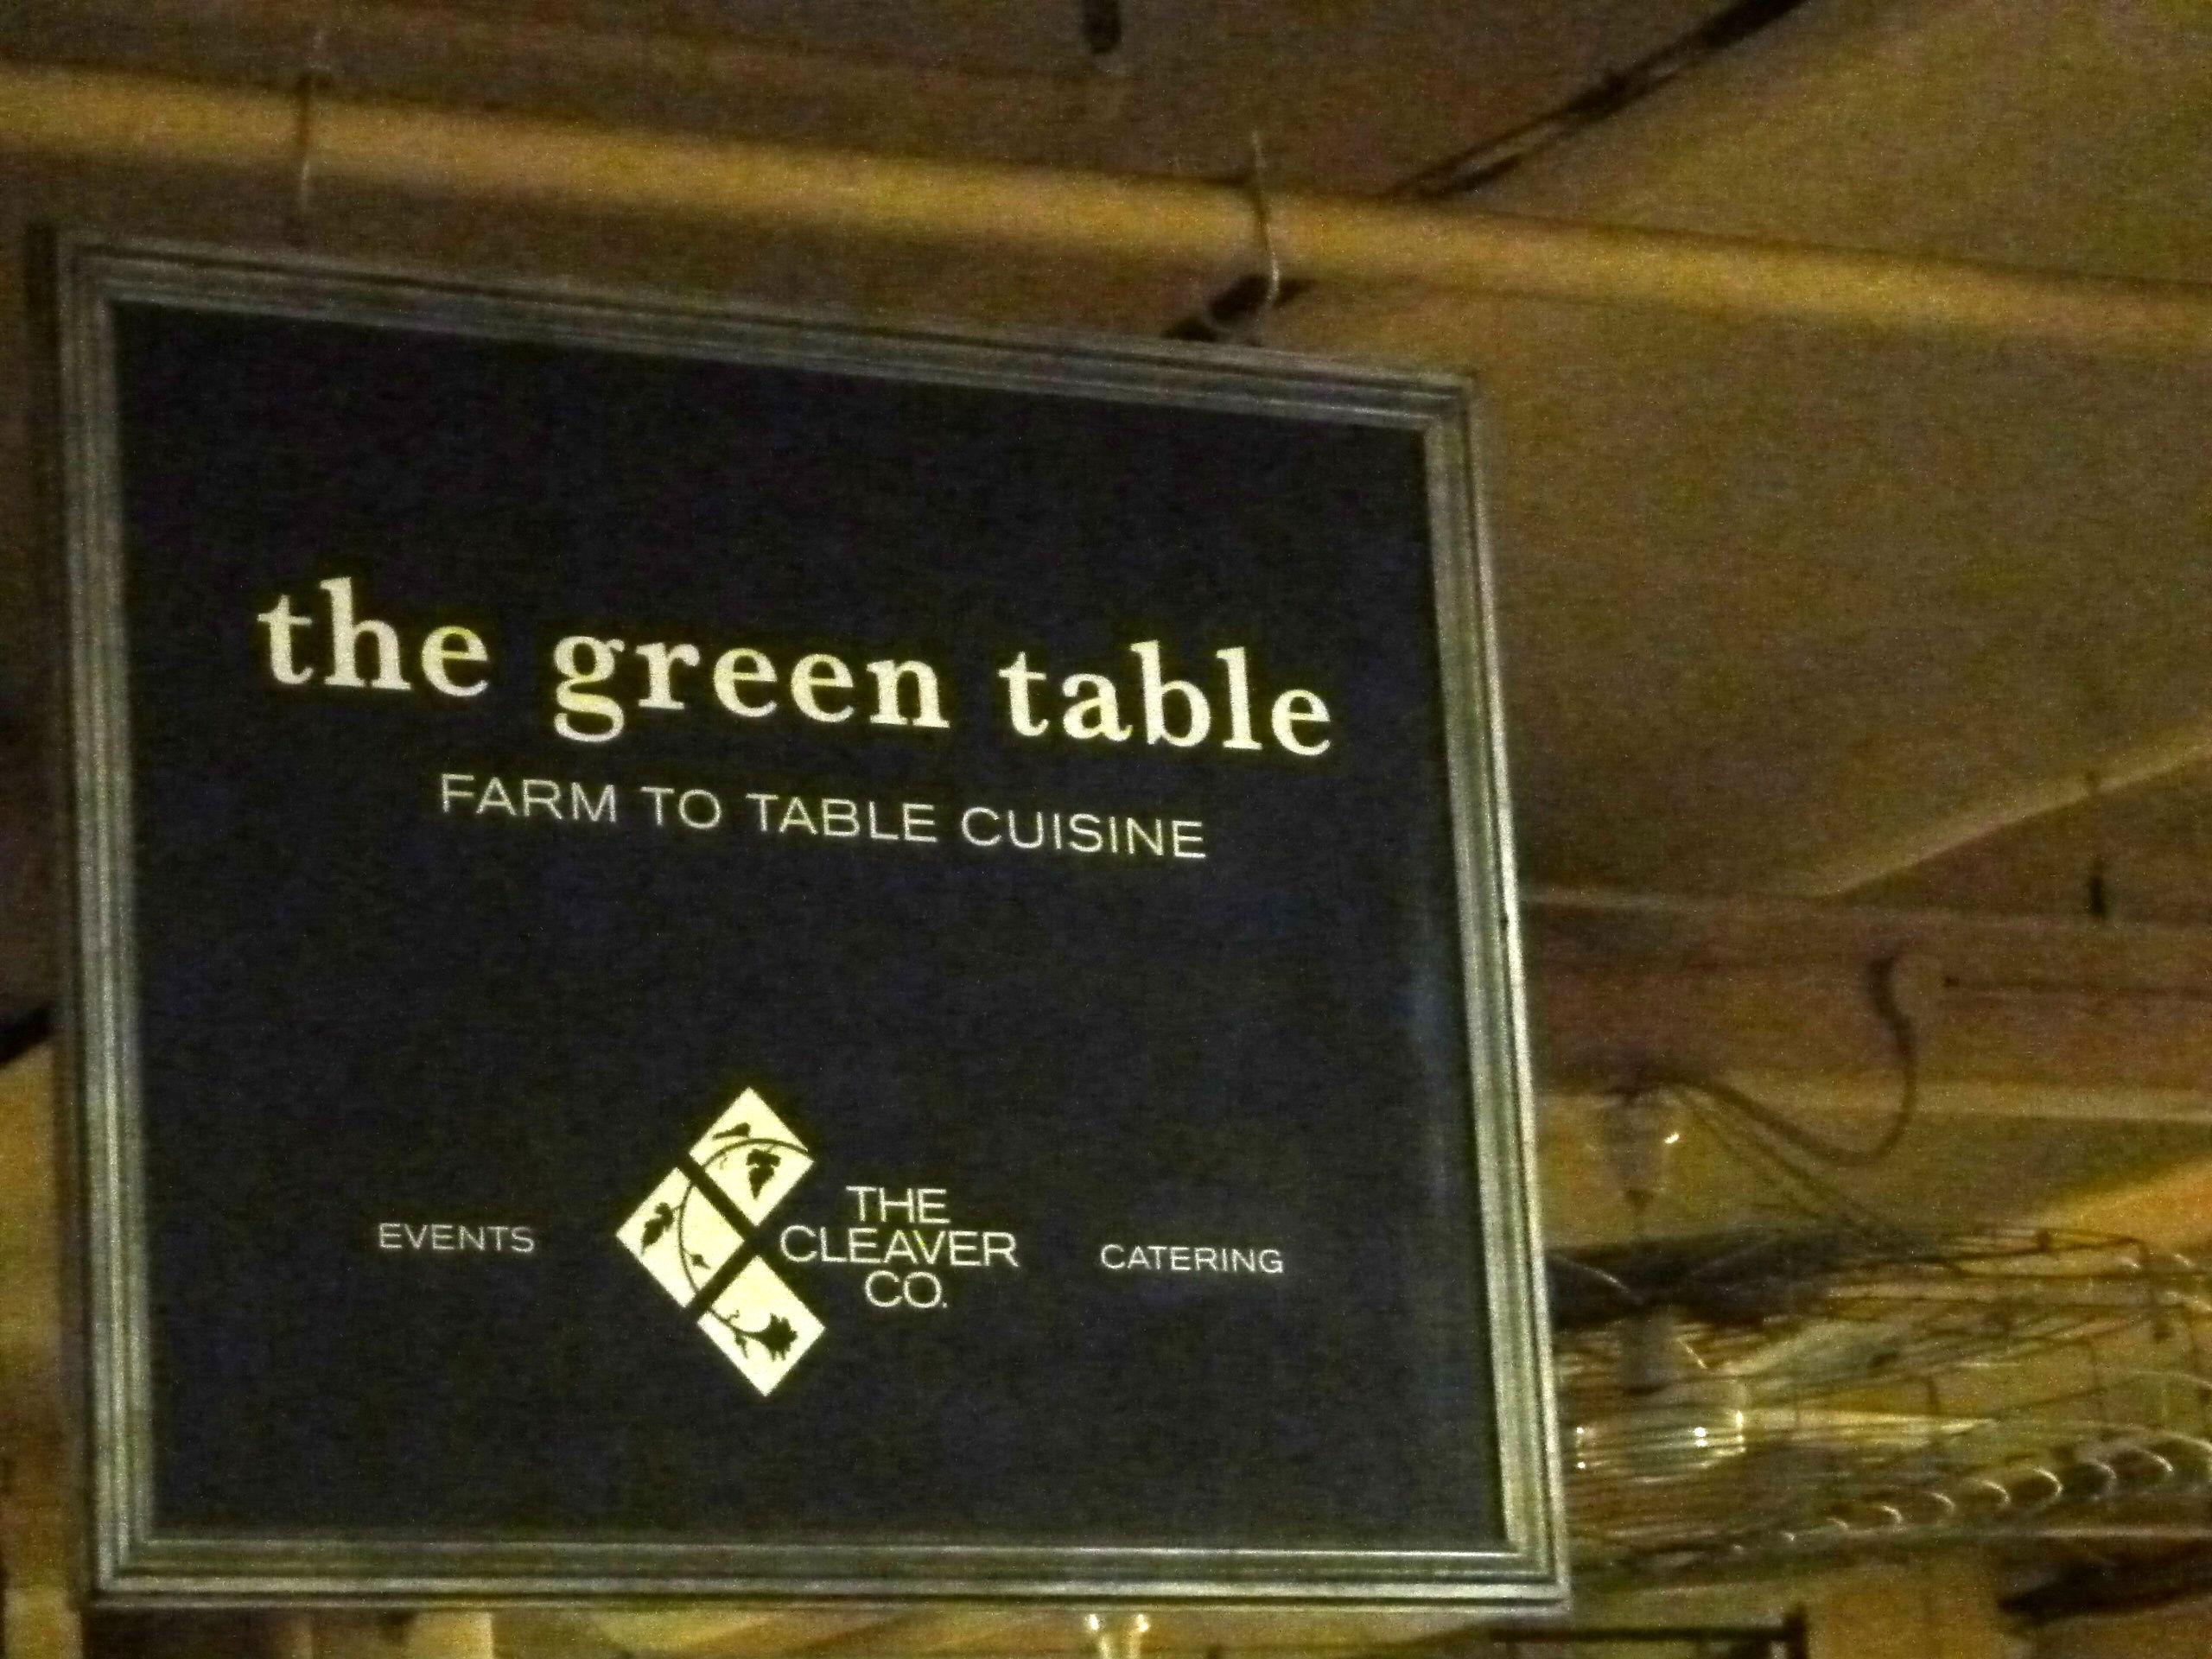 public relations events restaurant sign